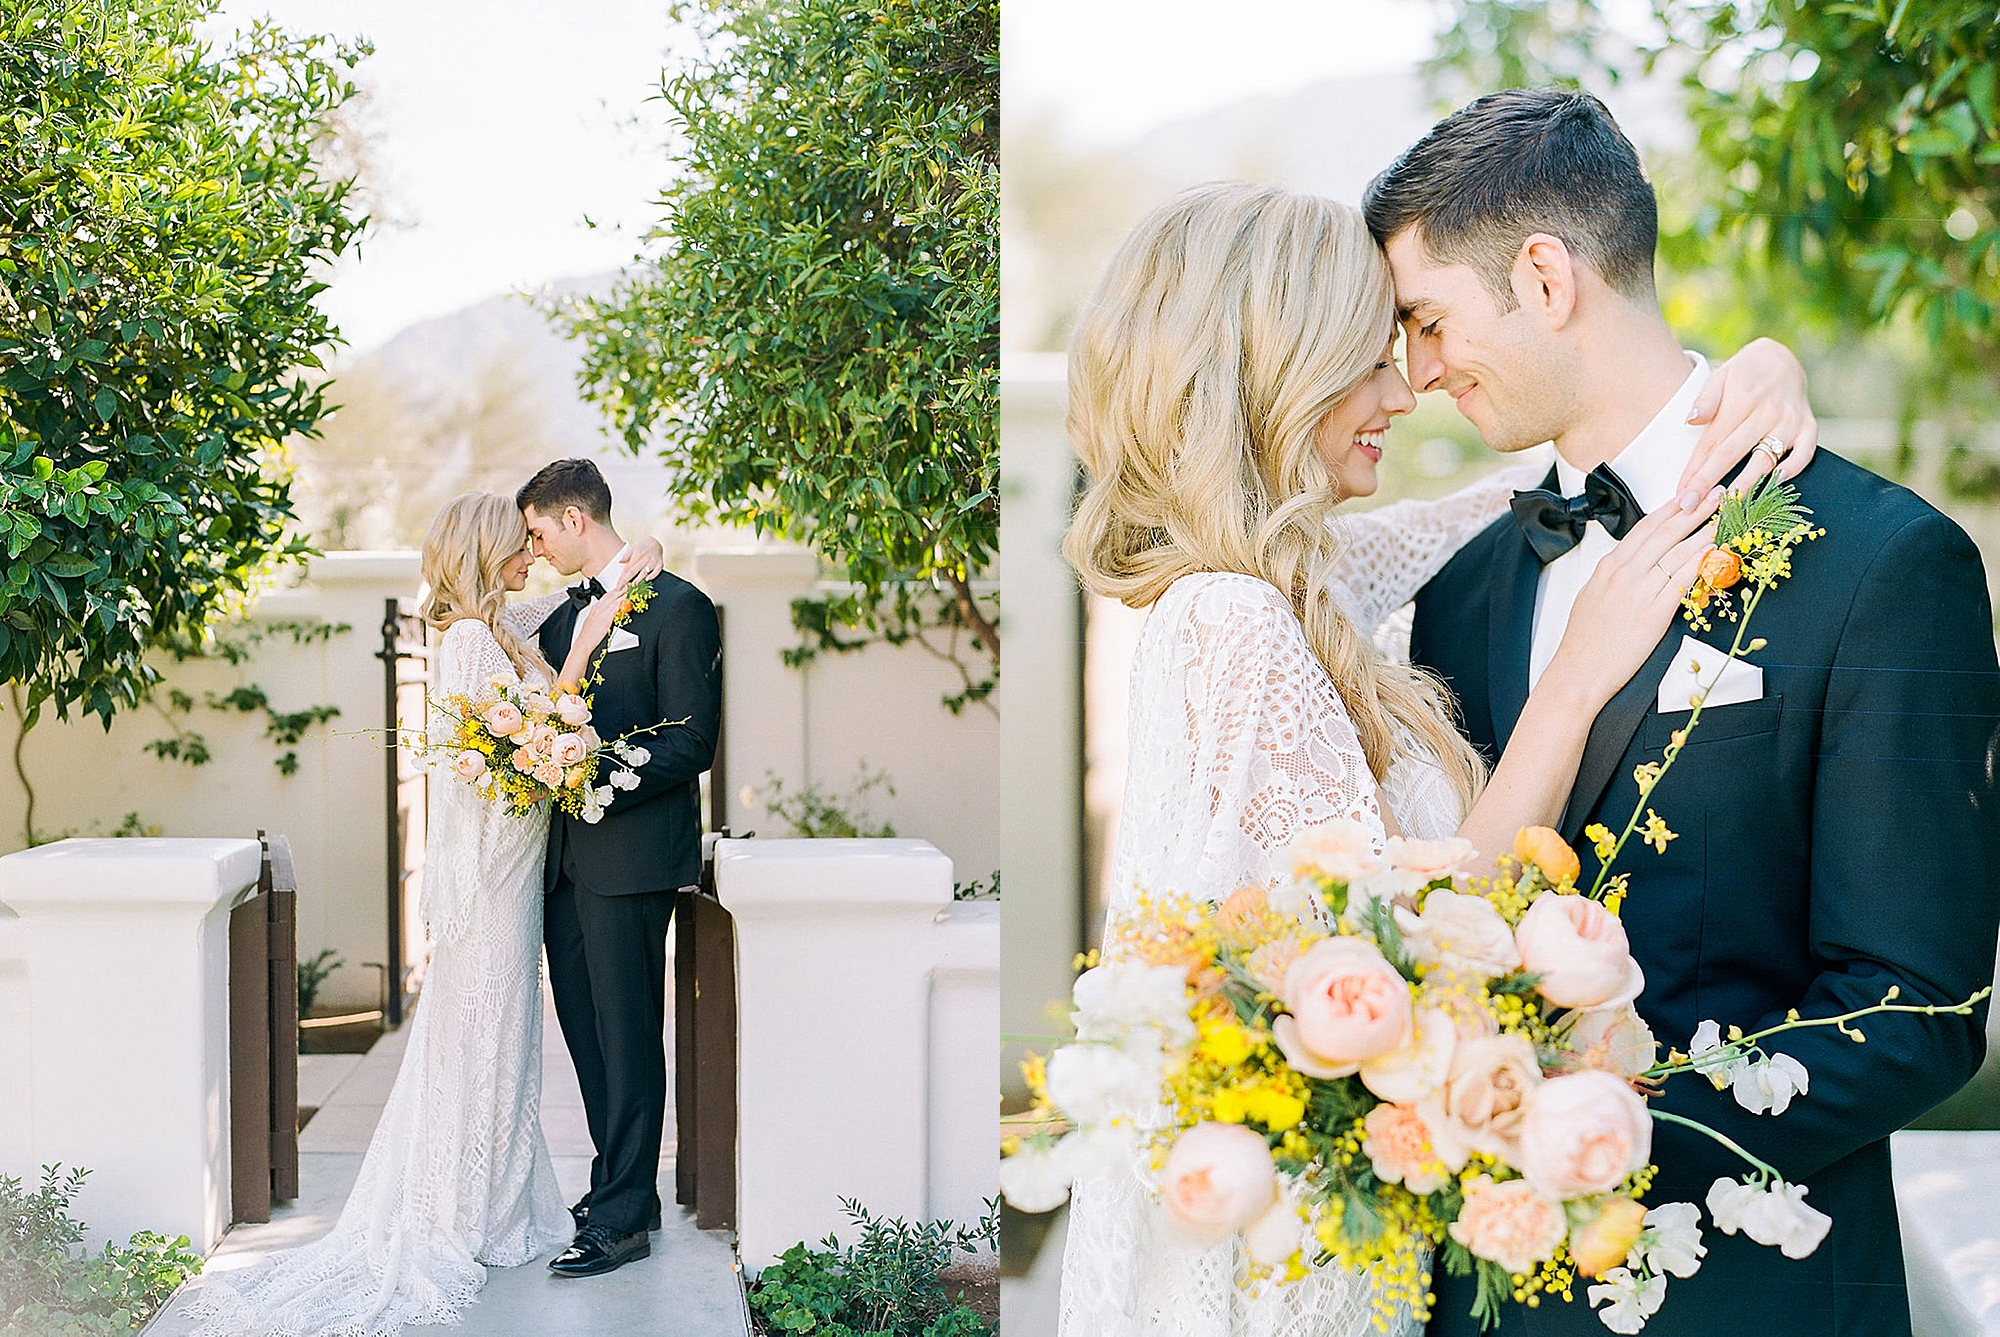 El Chorro Sedona AZ Wedding Photography by Magi Fisher of Magdalena Studios 0020